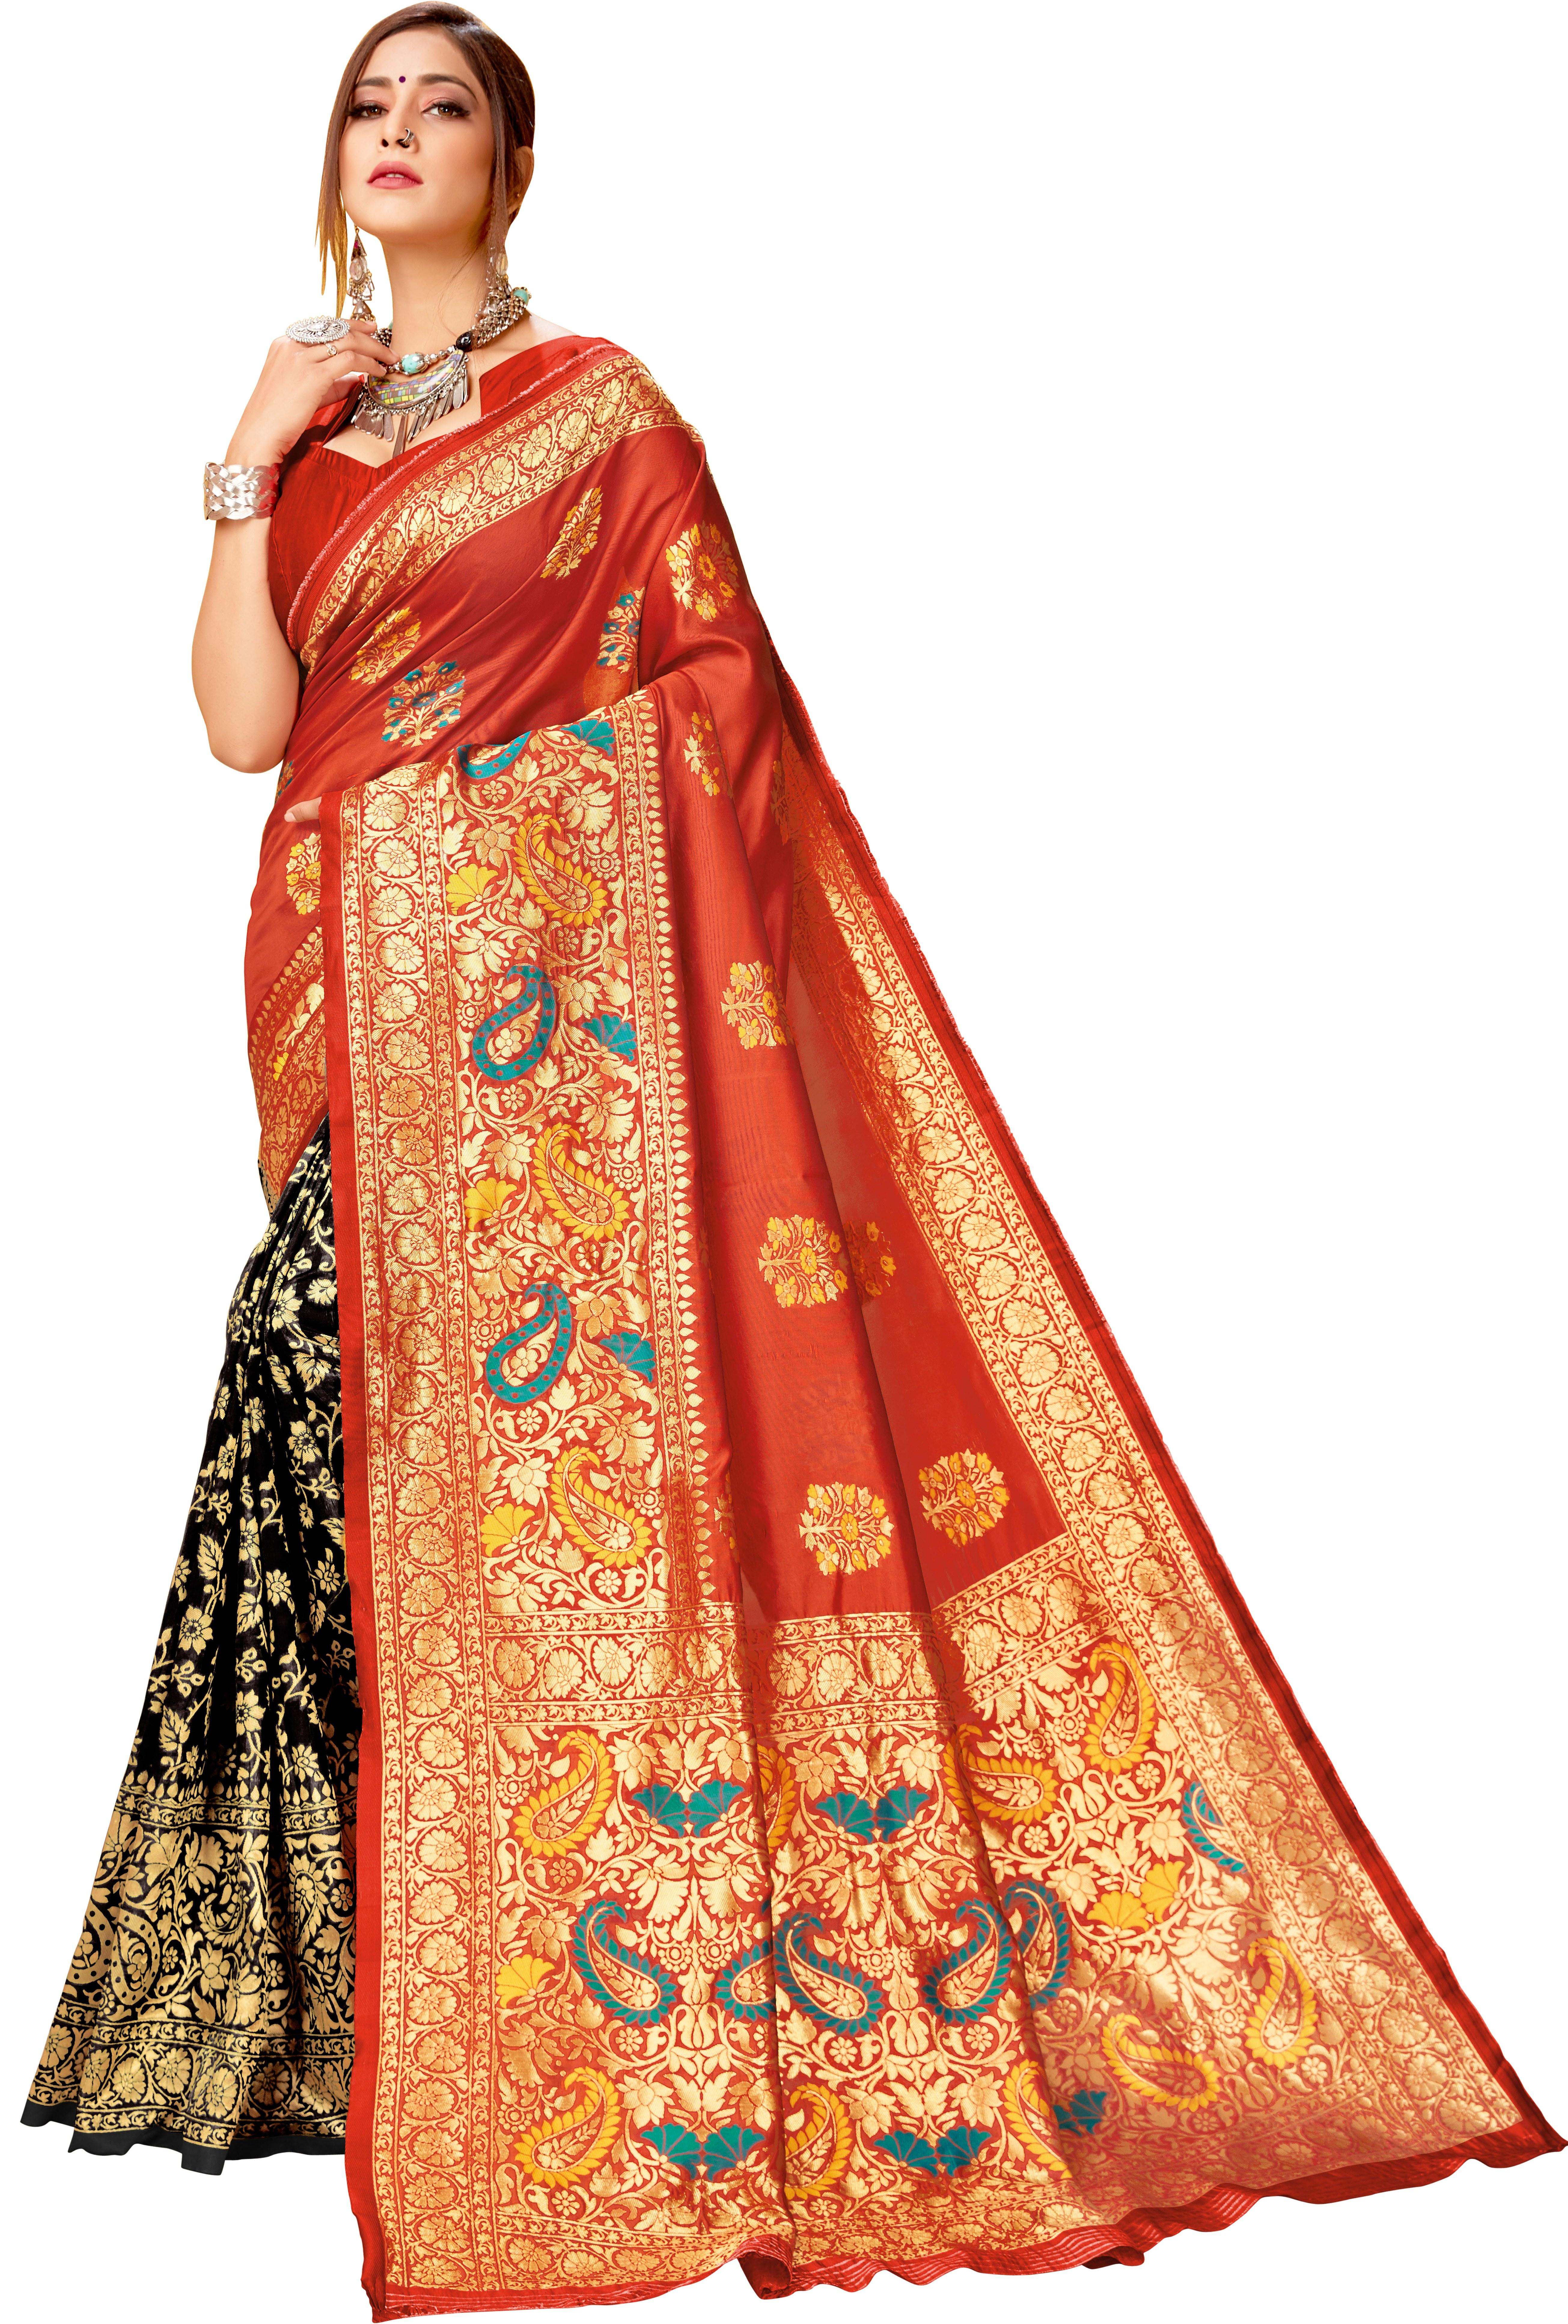 Glemora Red & Black Lichi Cotton Virasat Saree With Unstitched Blouse